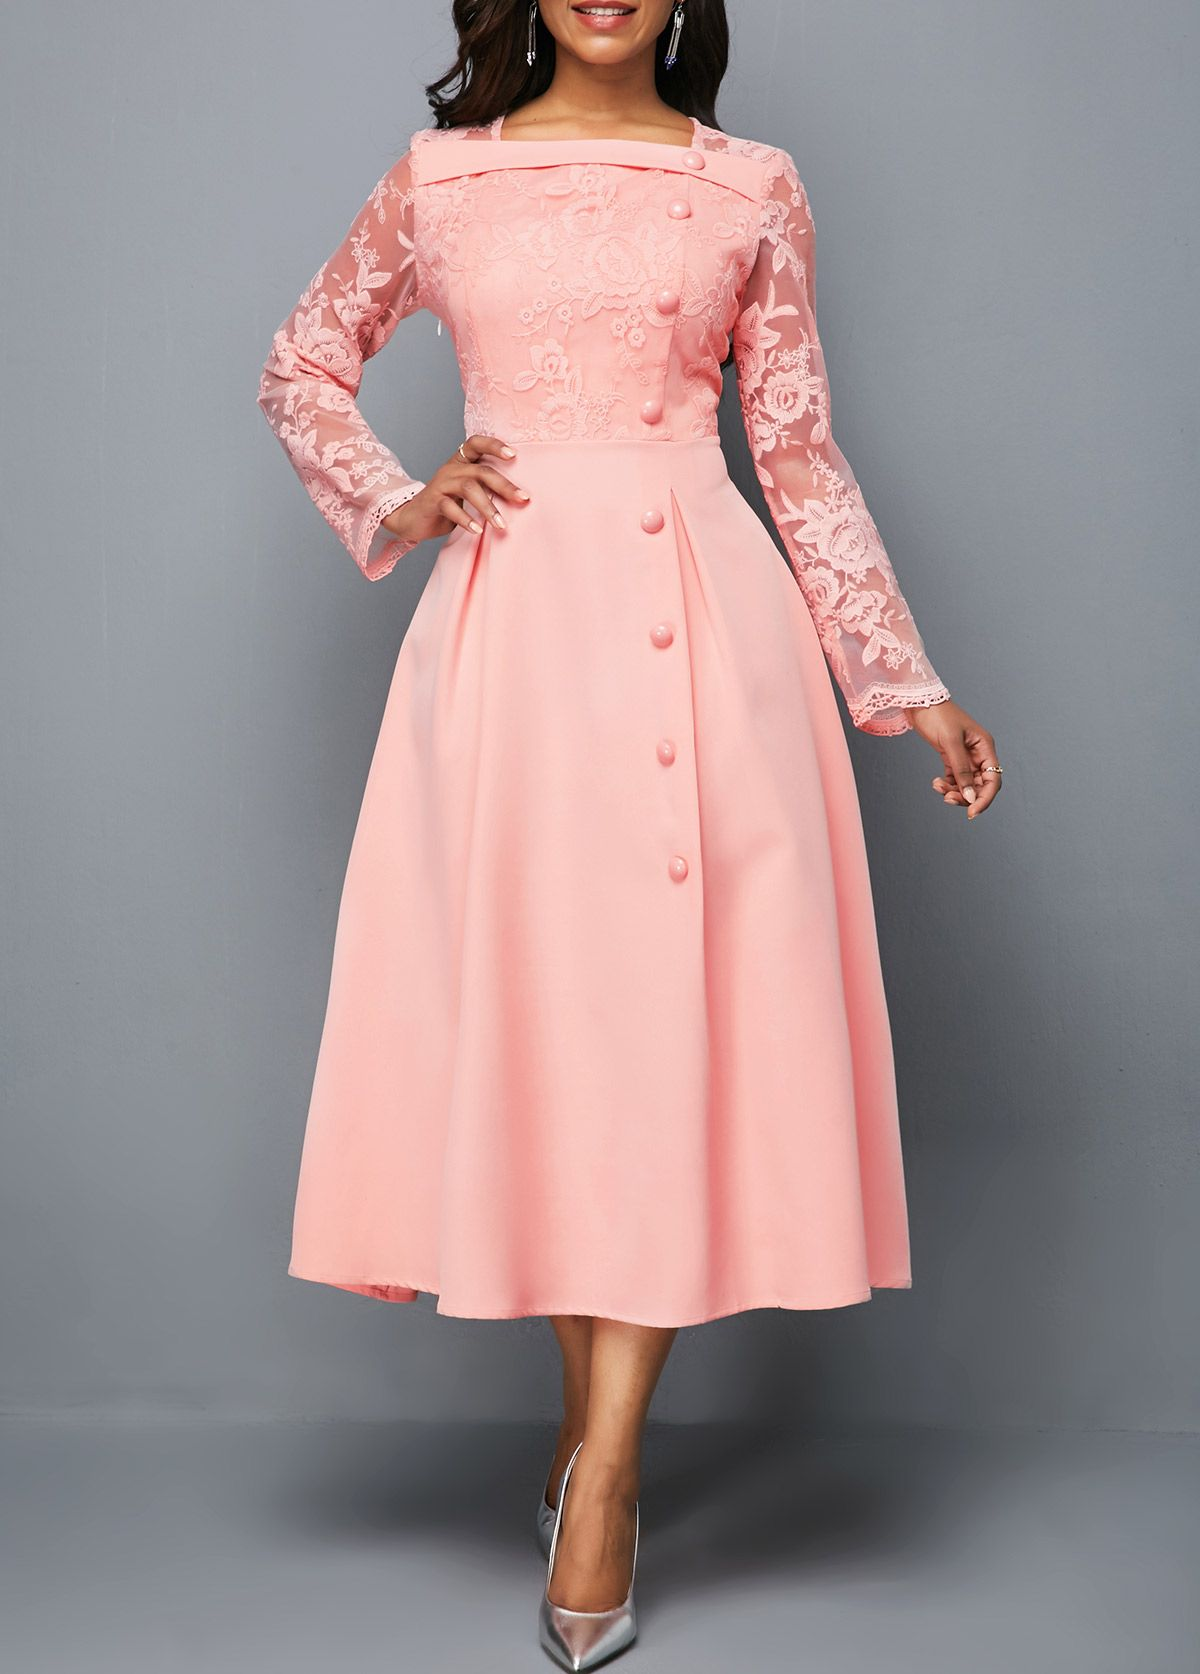 Lace Panel Button Detail Square Neck Dress Rotita Com